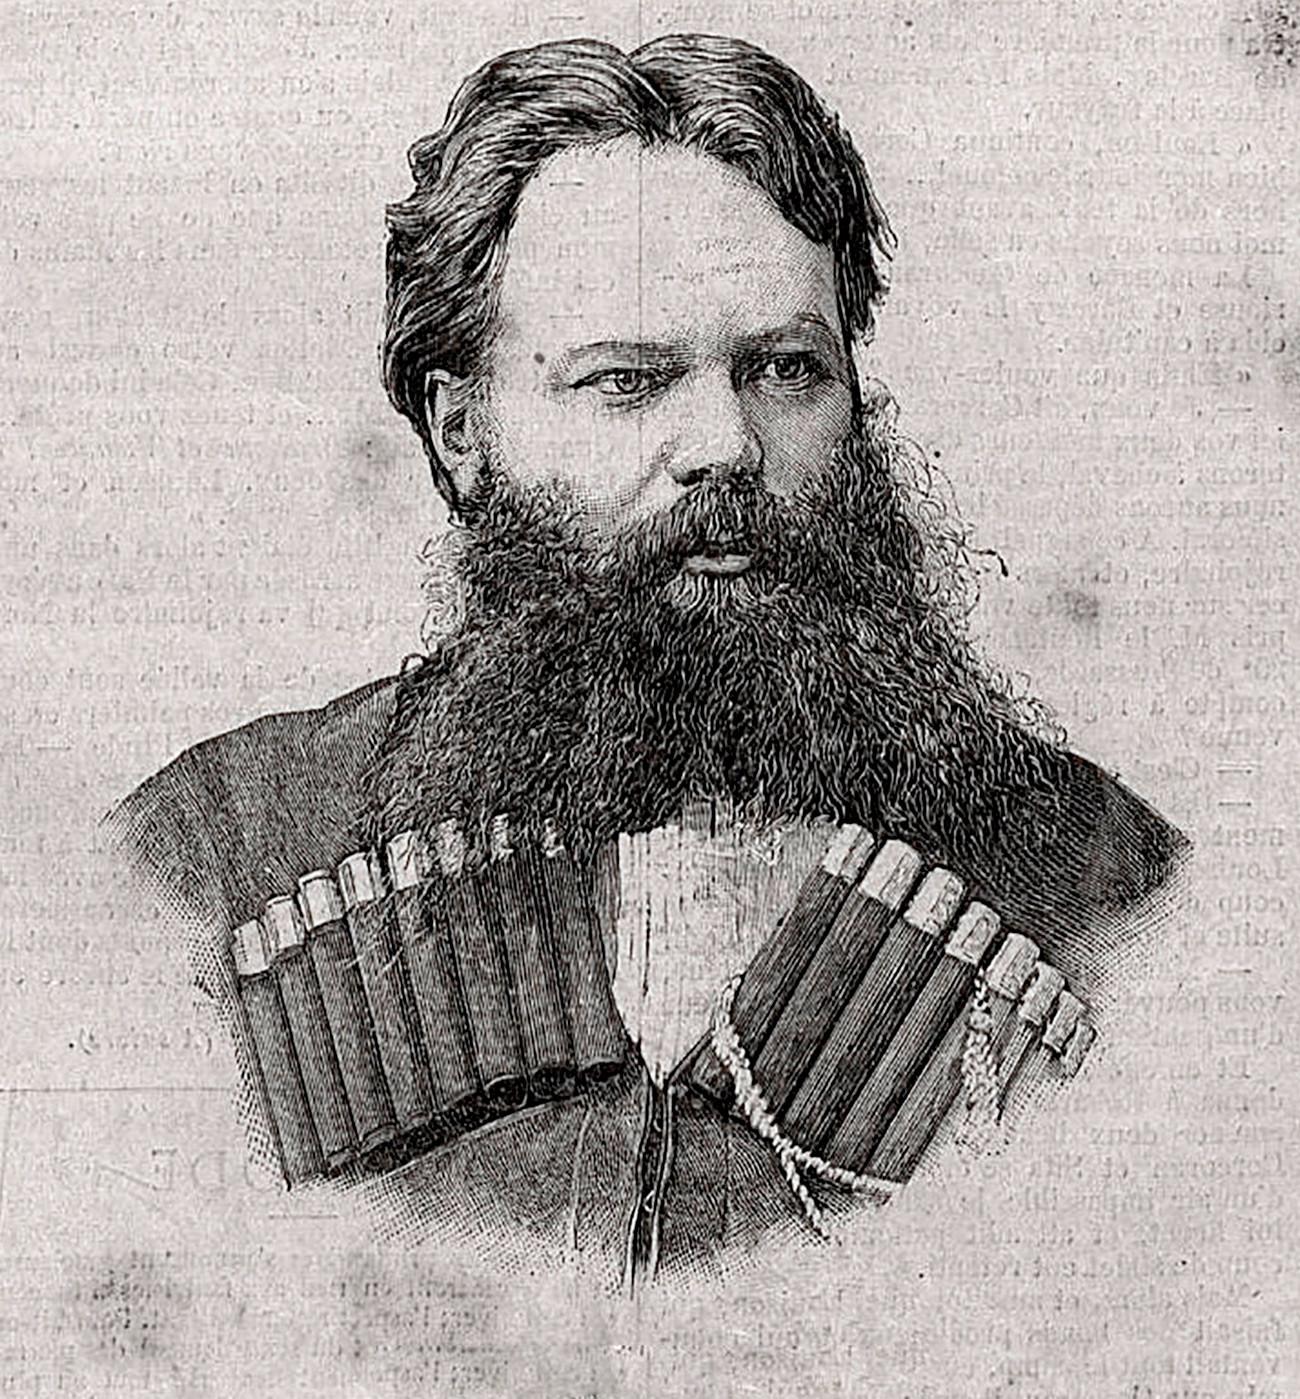 Nikolaï Achinov